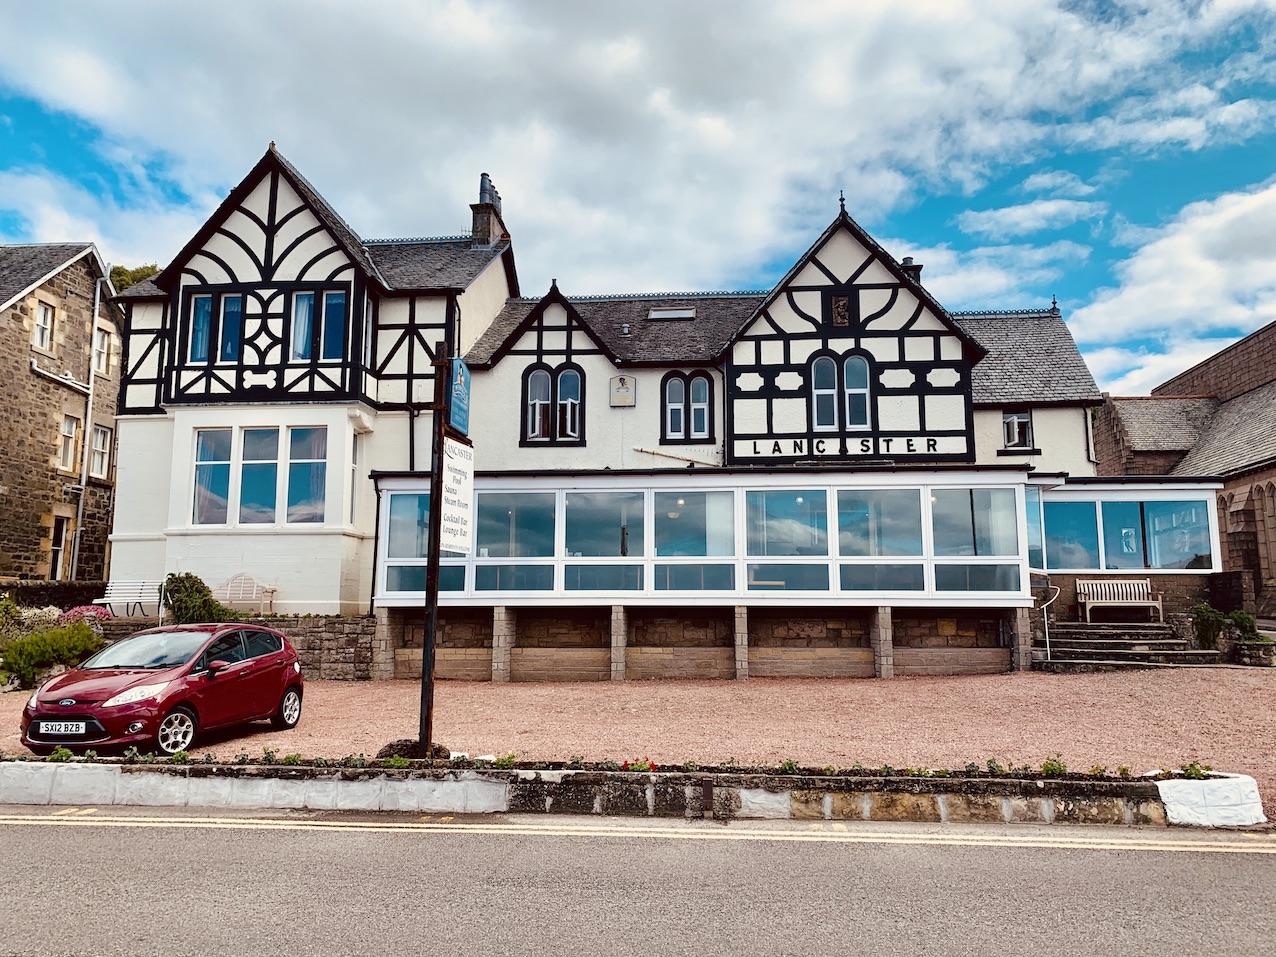 The Lancaster Hotel Oban Scotland.